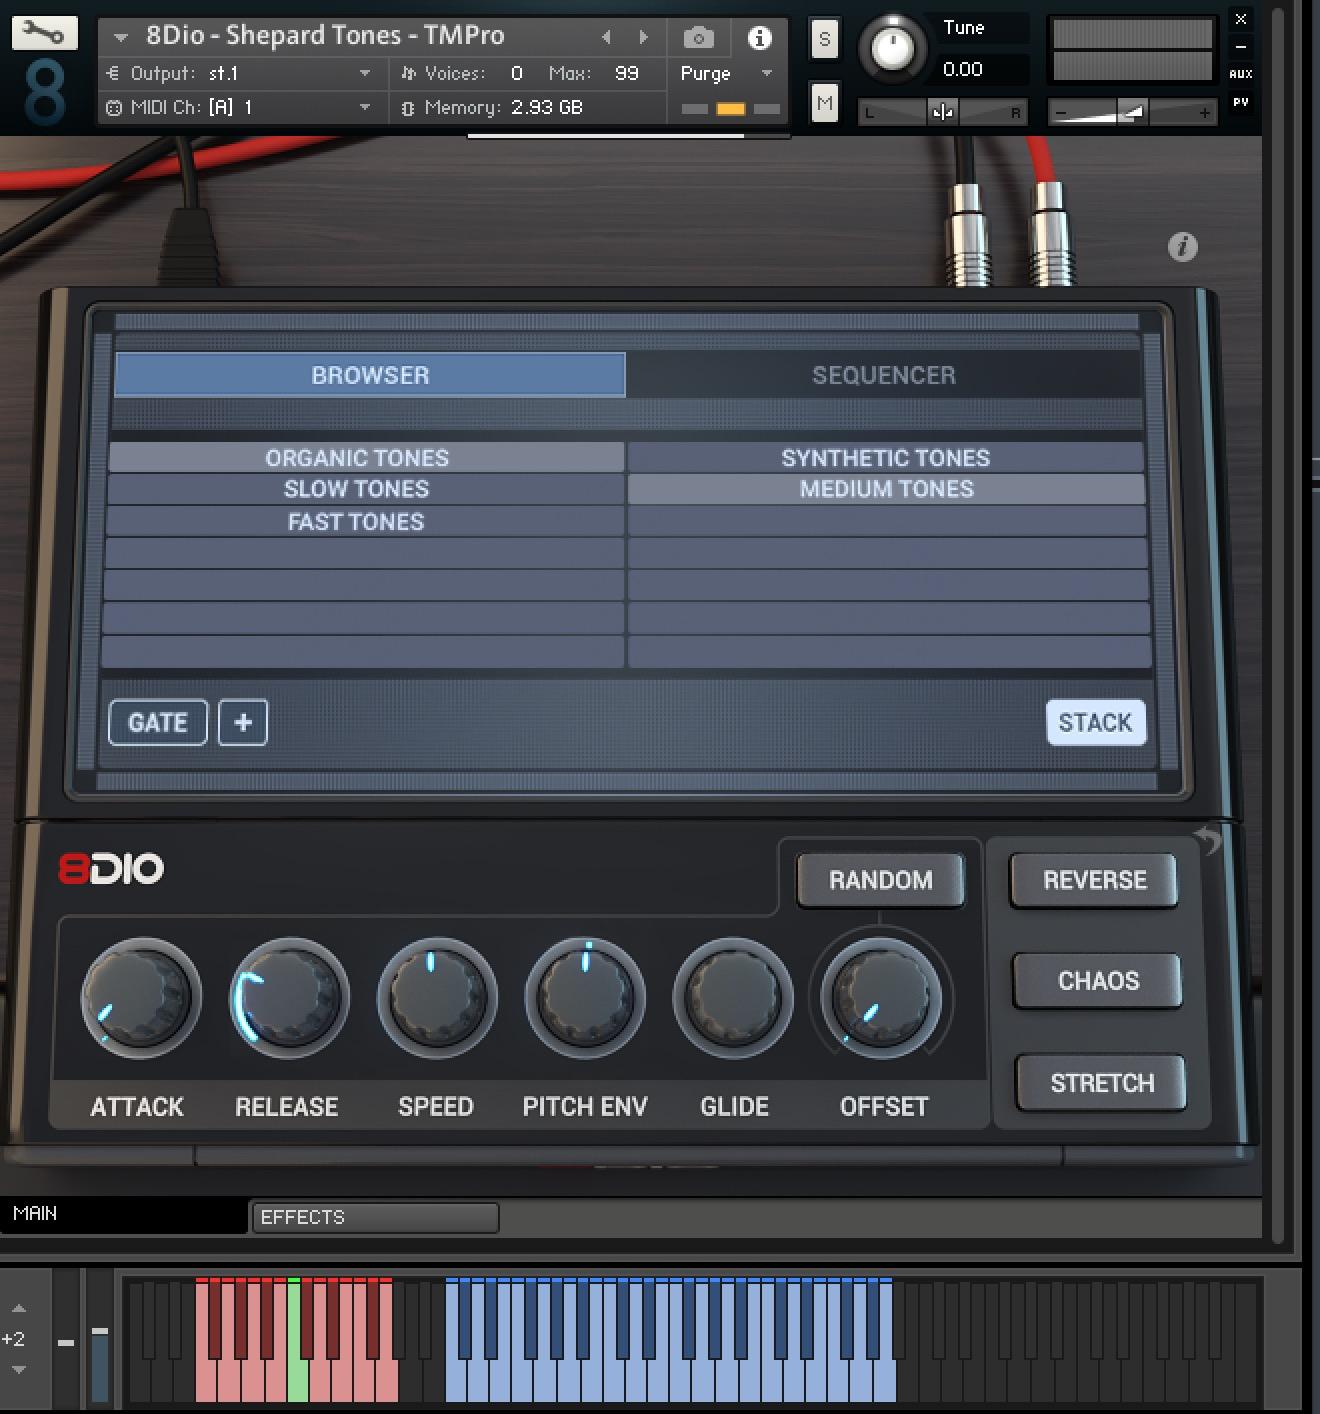 Shepard Tones by 8DIO Review | StrongMocha